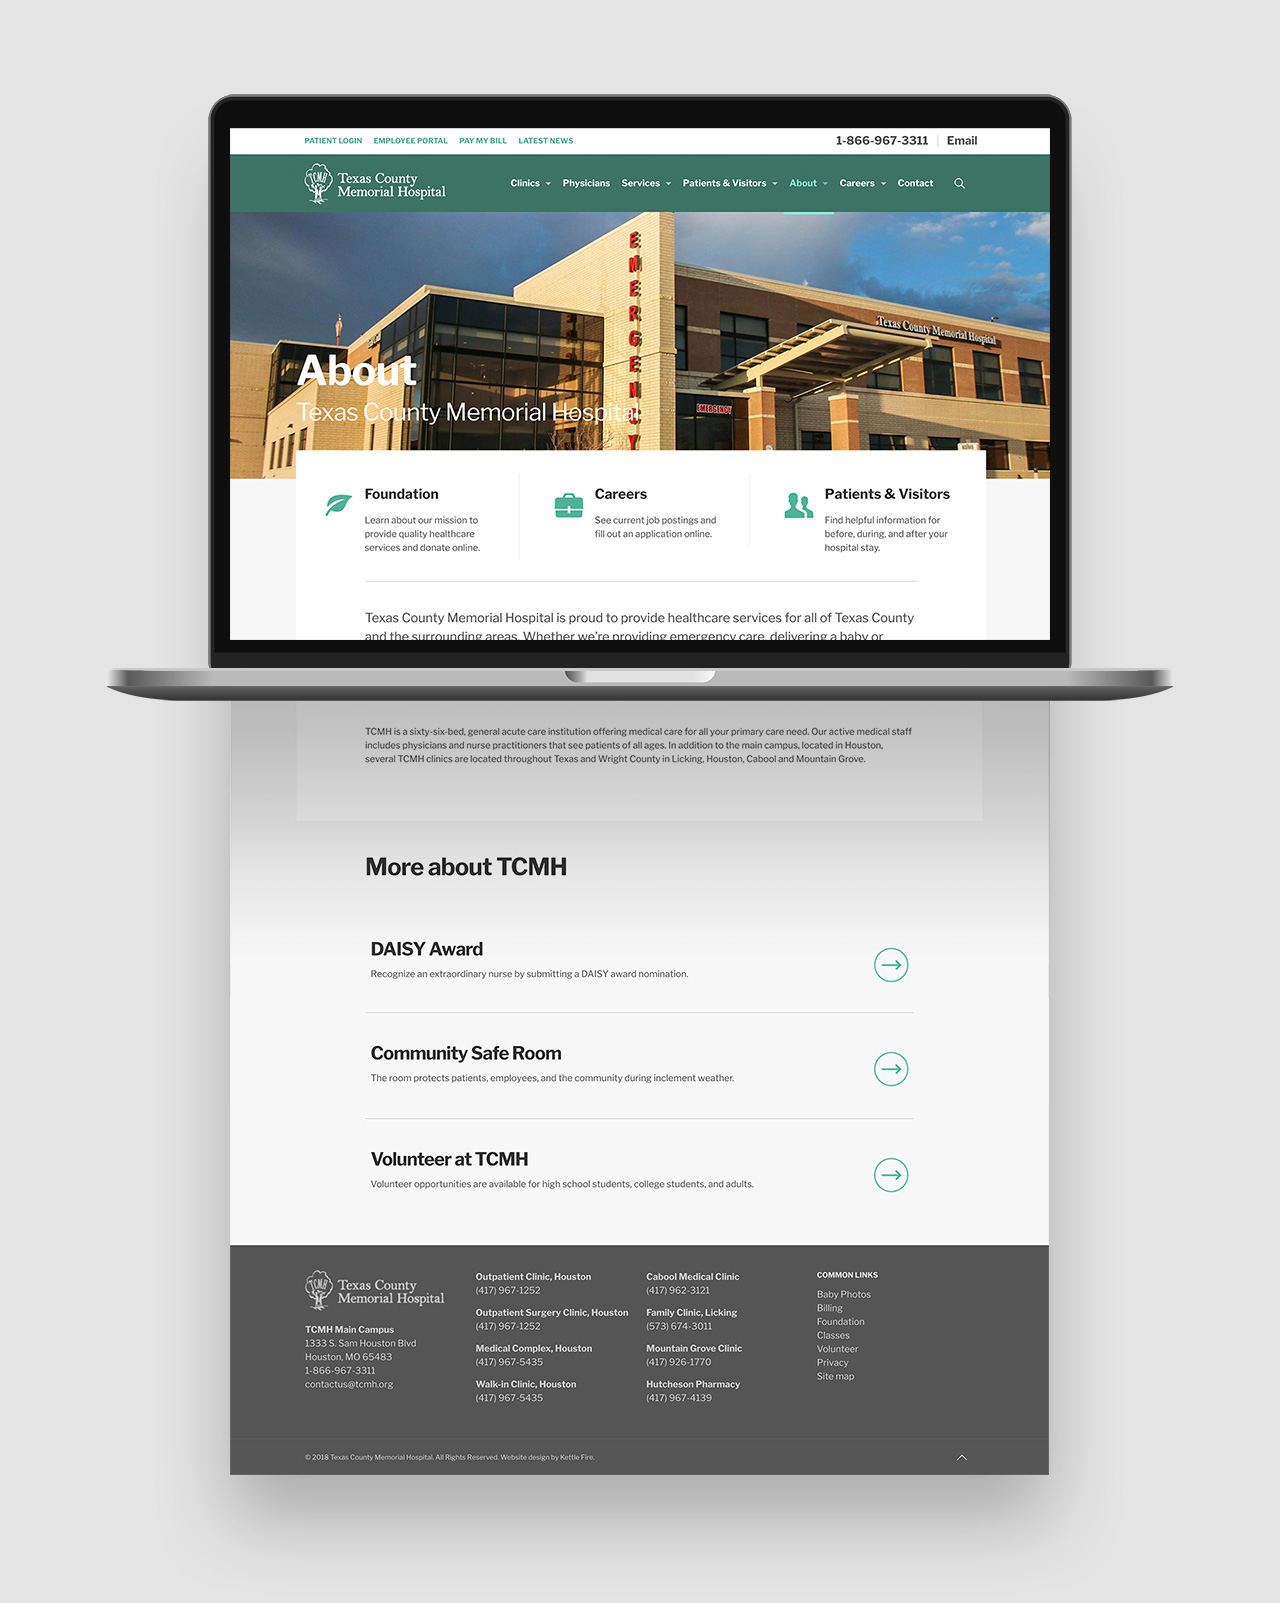 website design SEO Texas County Memorial Hospital by Kettle Fire Creative website design Website Design + SEORegional Hospital tcmh about mockup